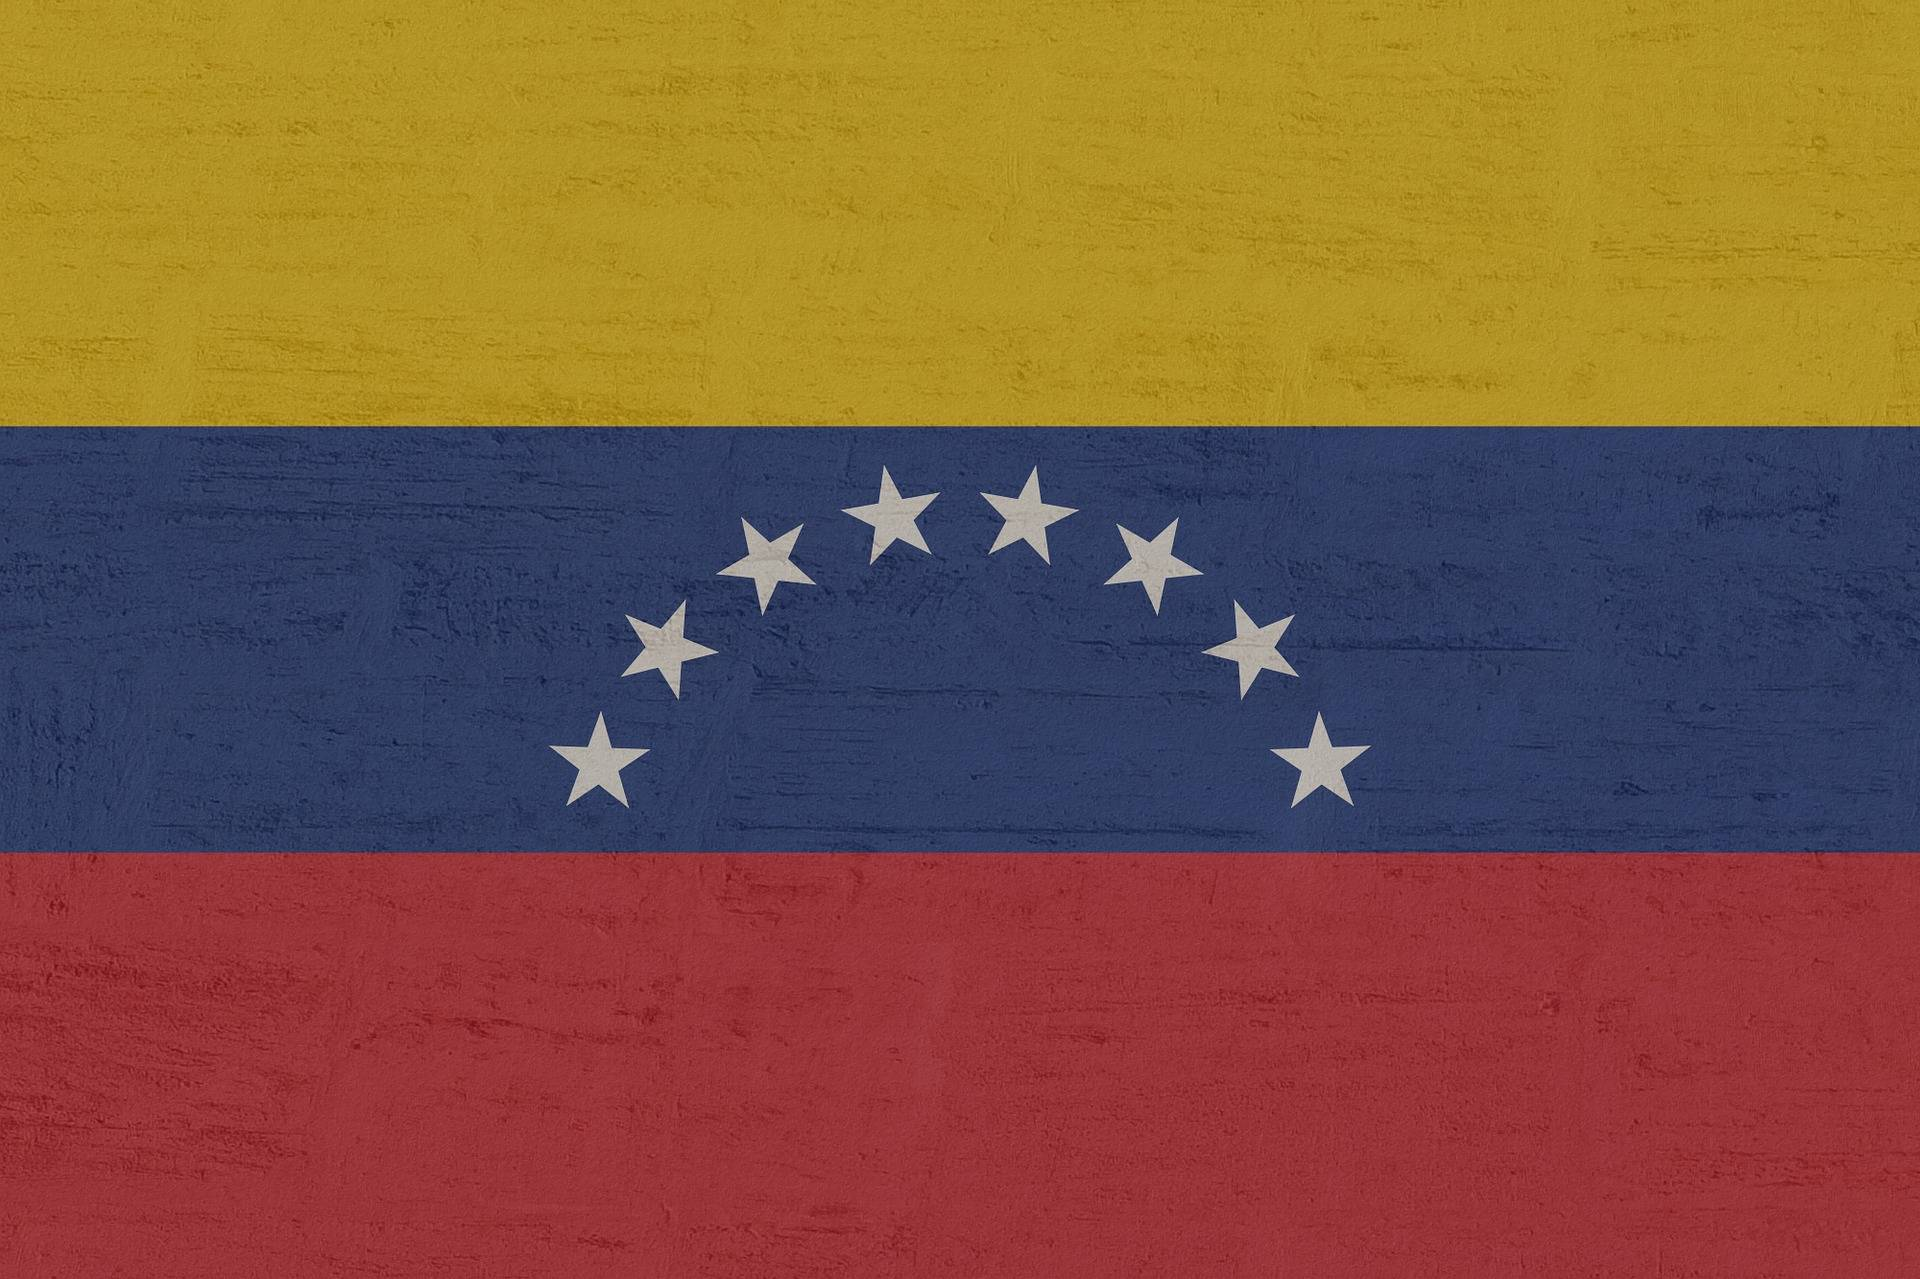 Venezuela verliert Gold